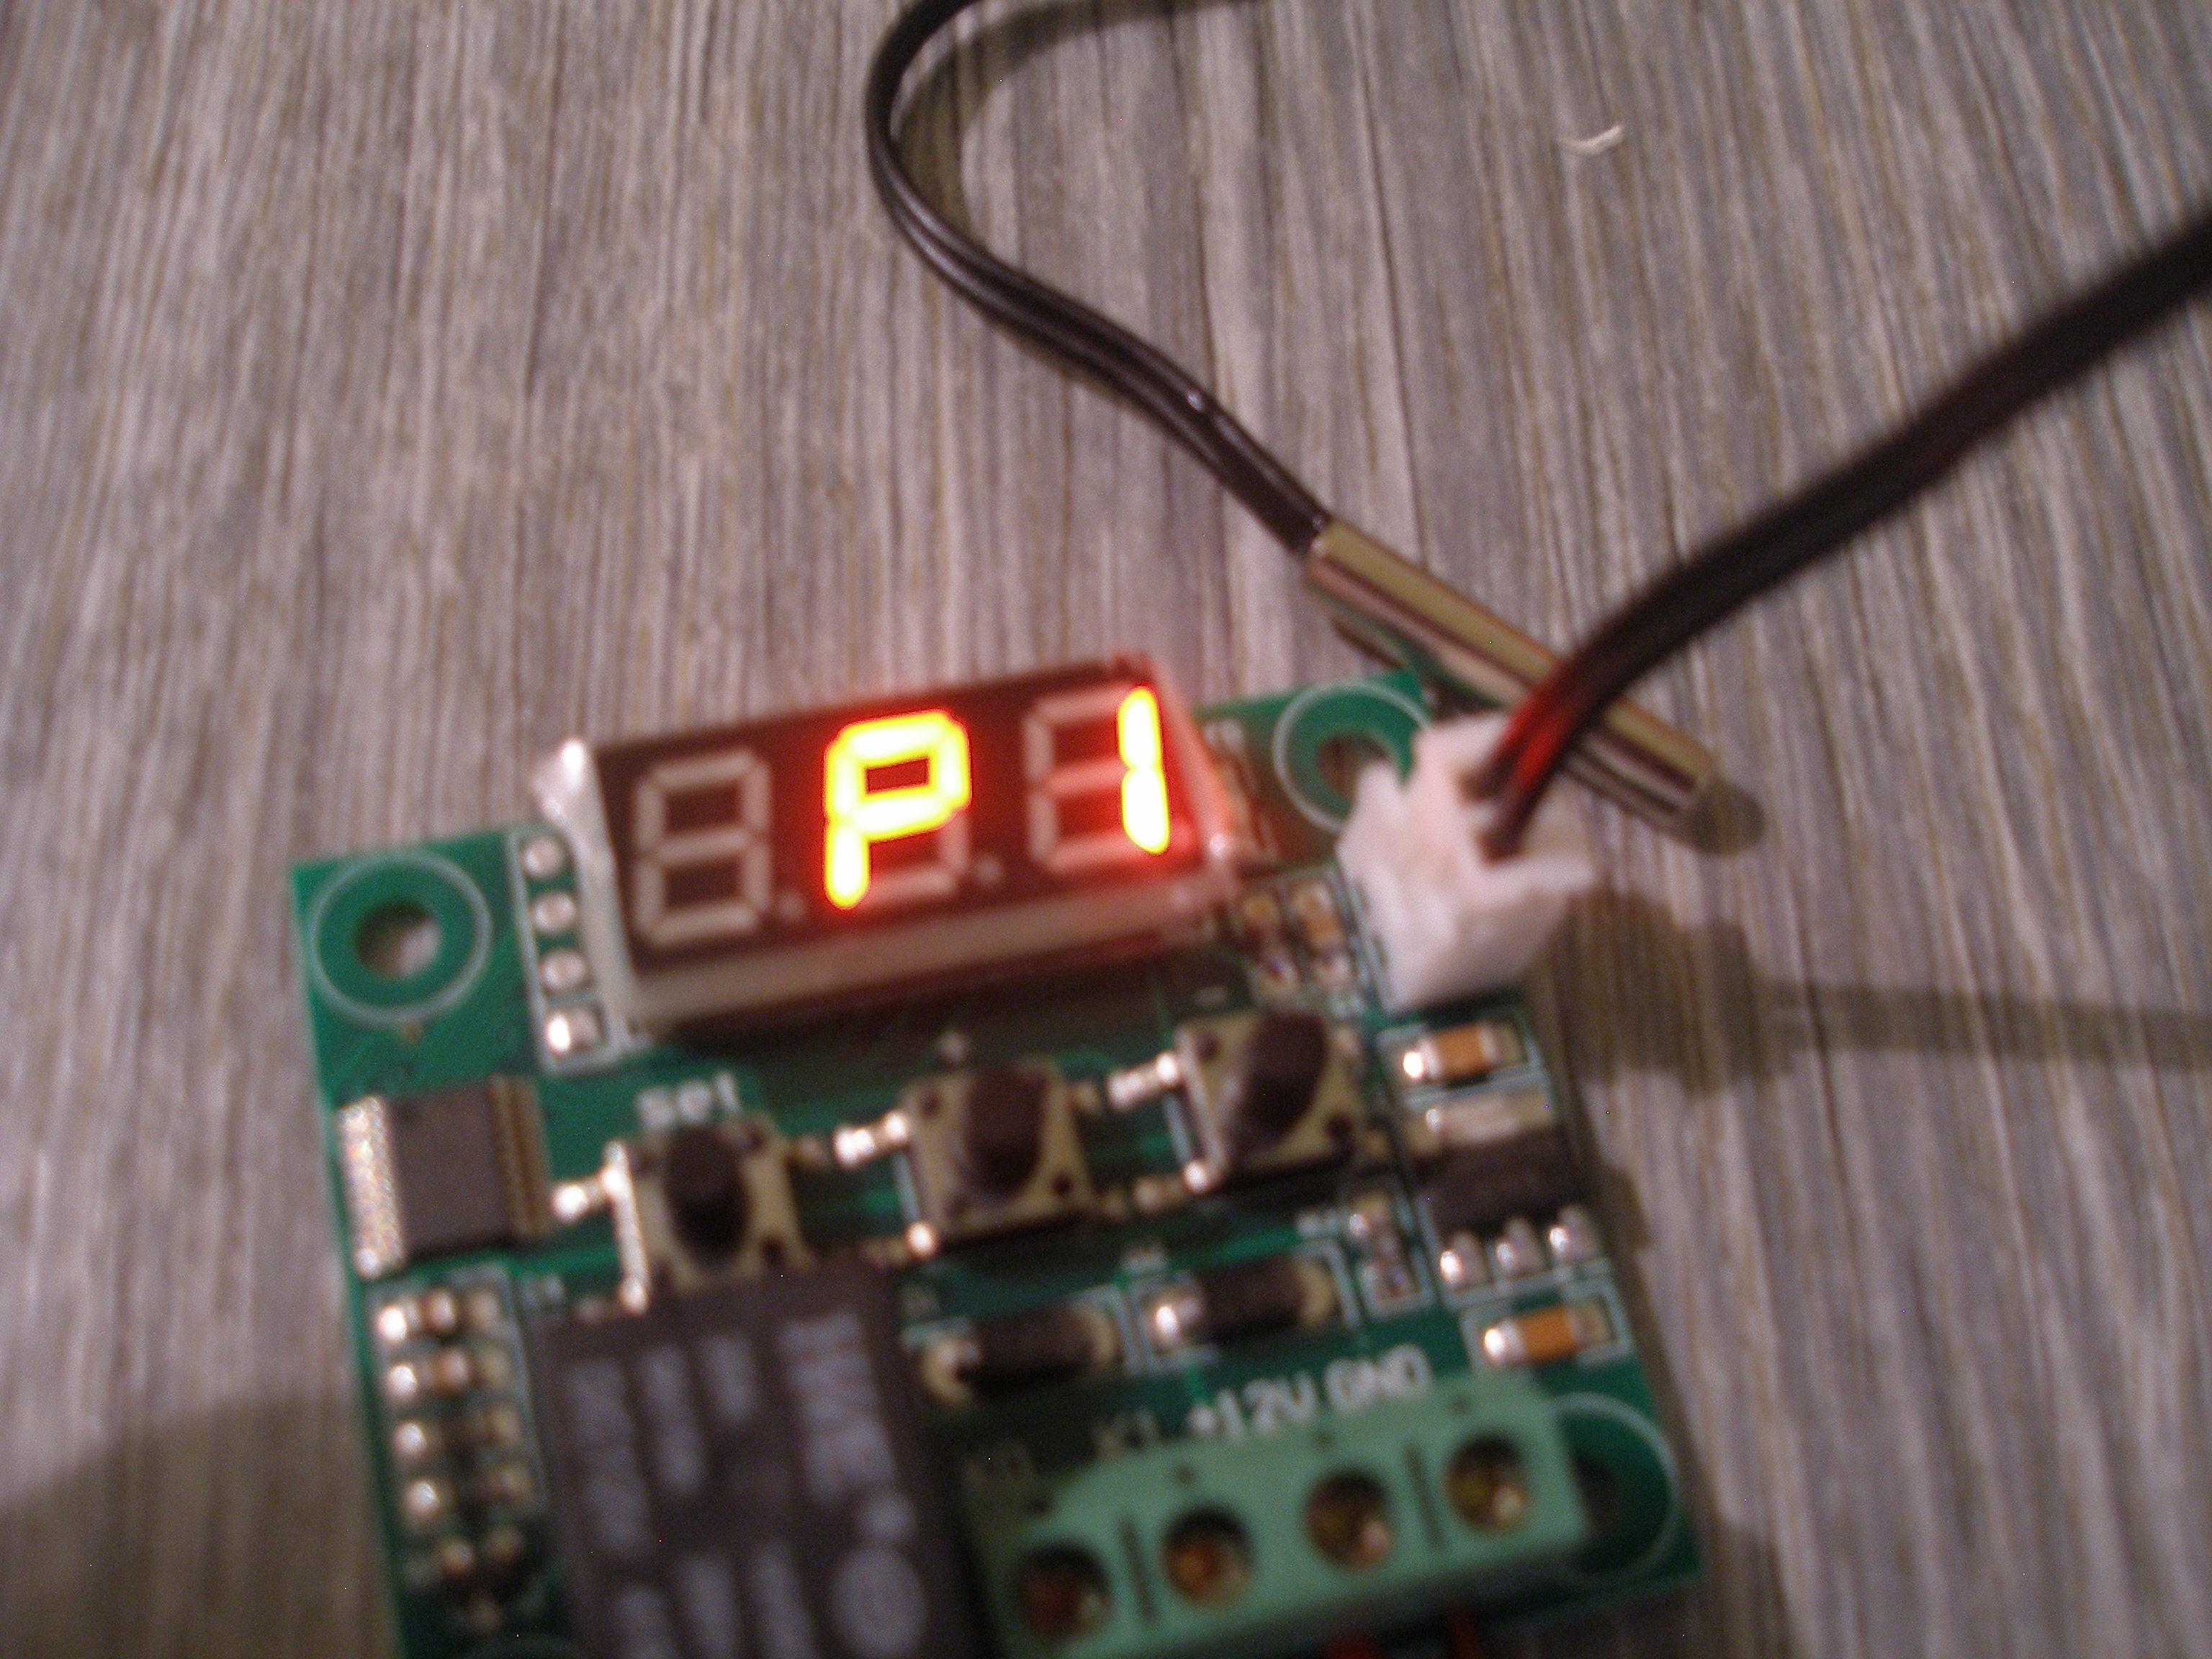 DC 12V Digital LED Thermostat Temperature Control^Switch Module XH-W1209CCO HU